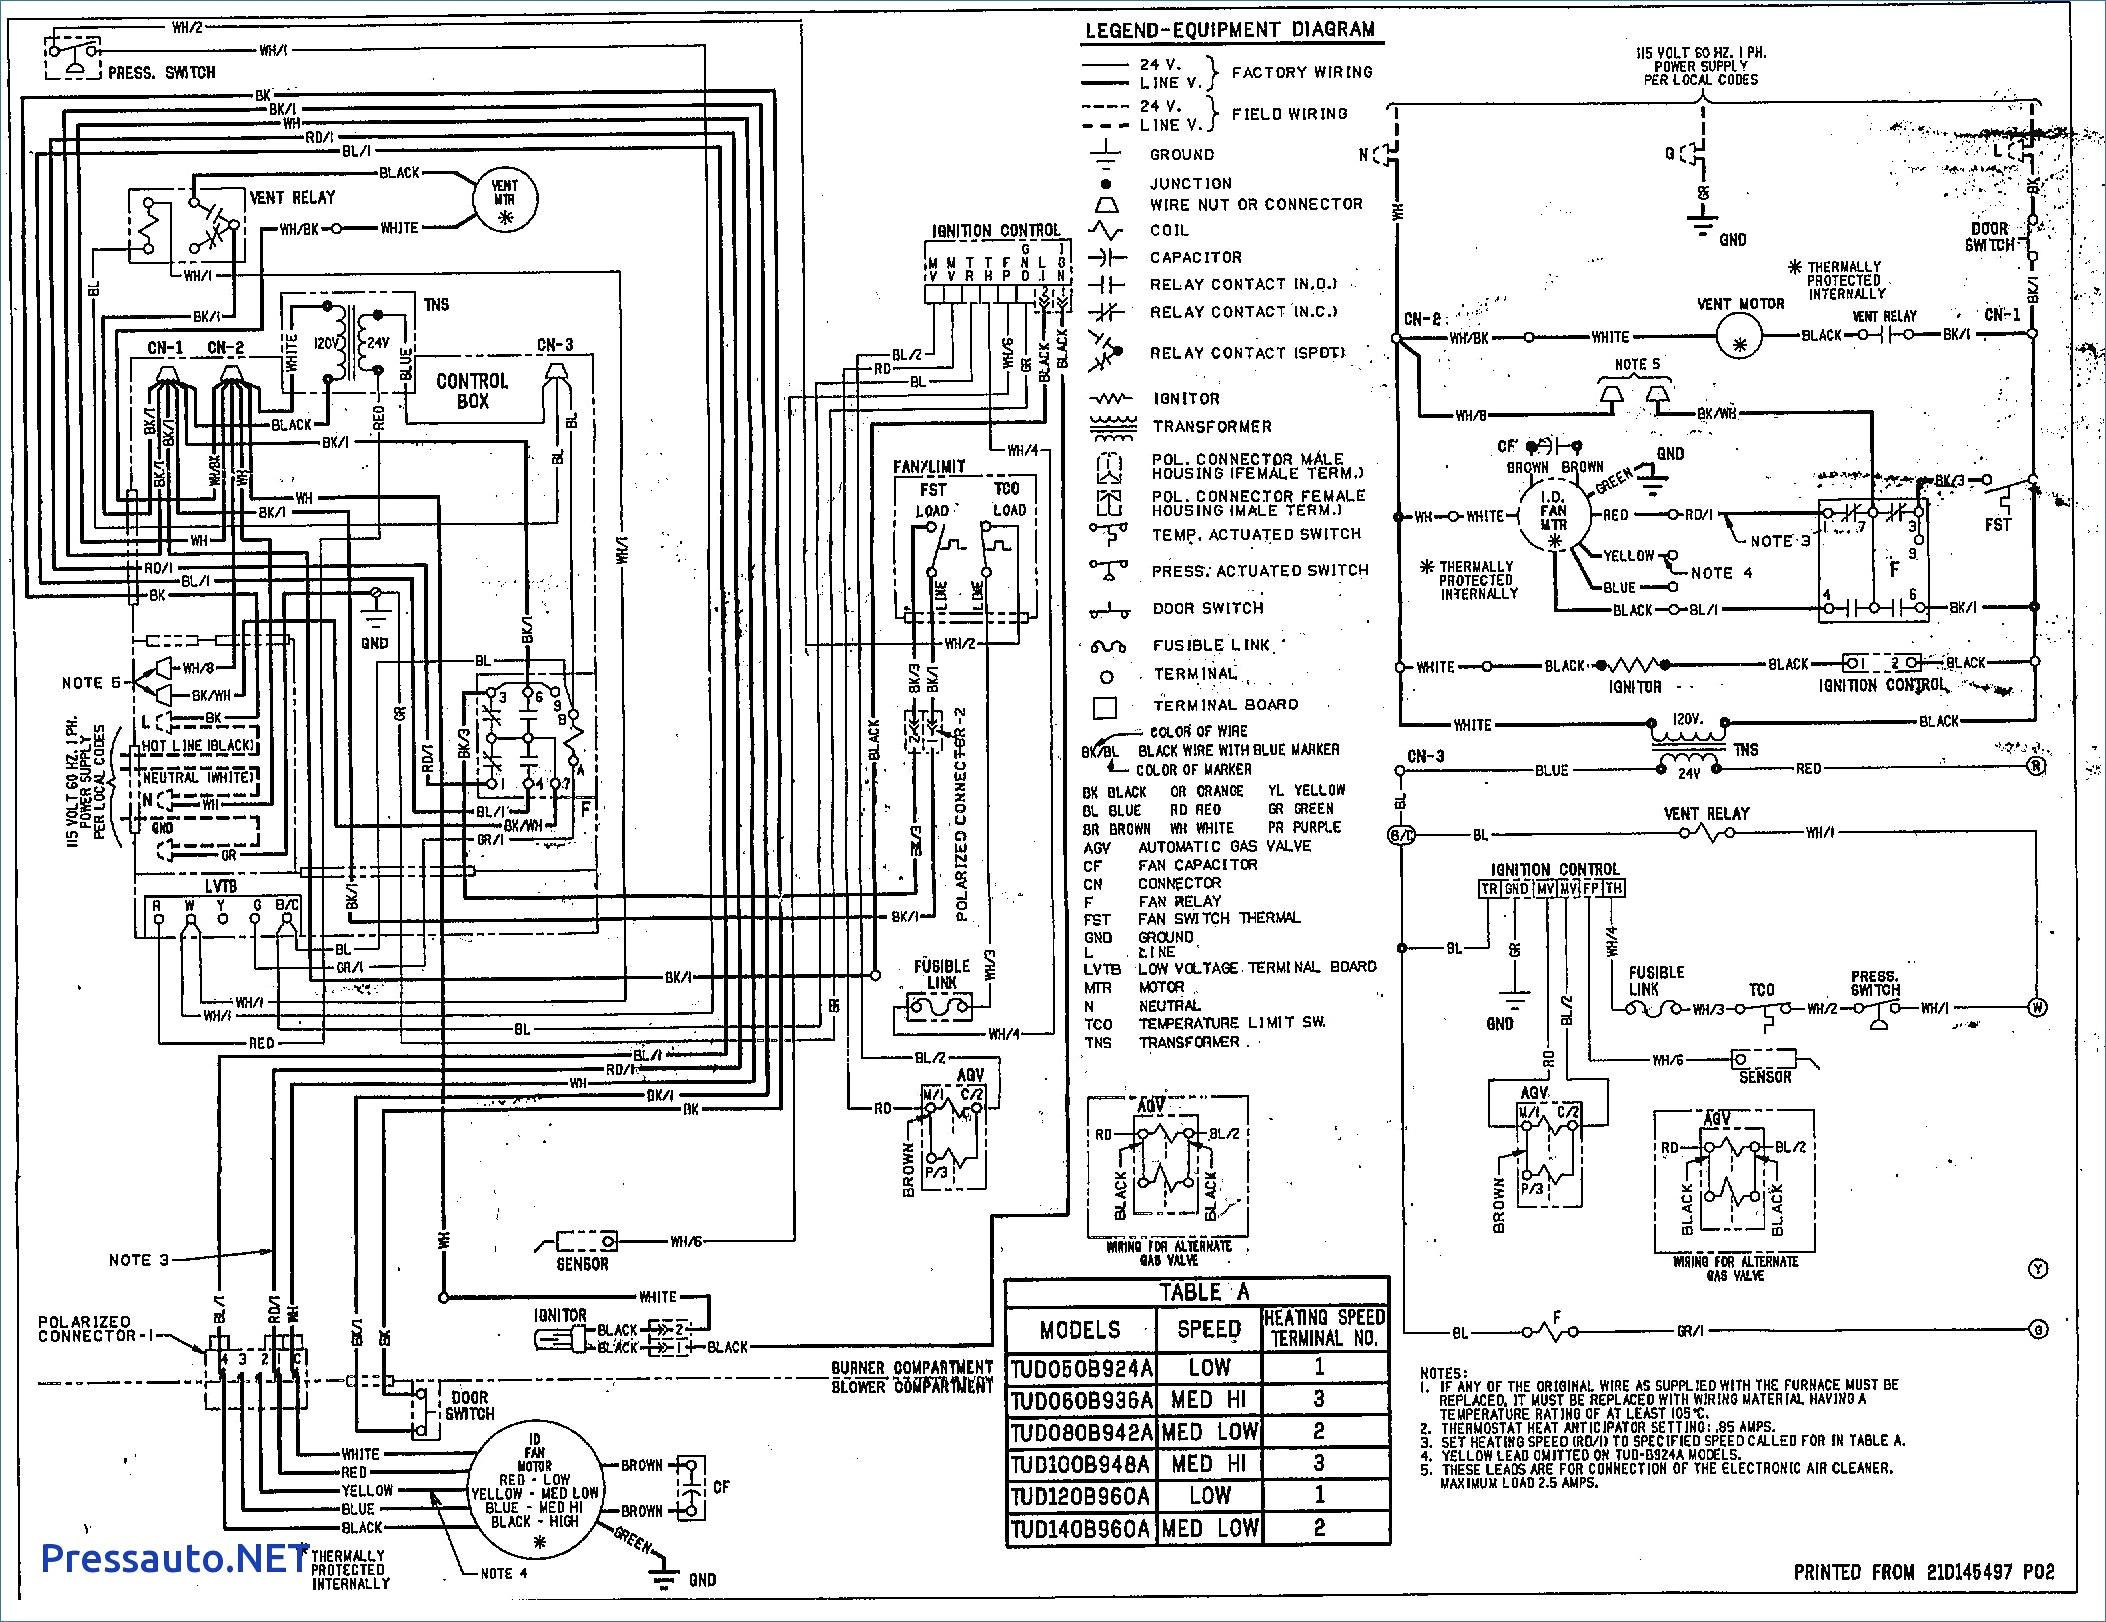 Trane Xe Heat Pump Wiring Diagram